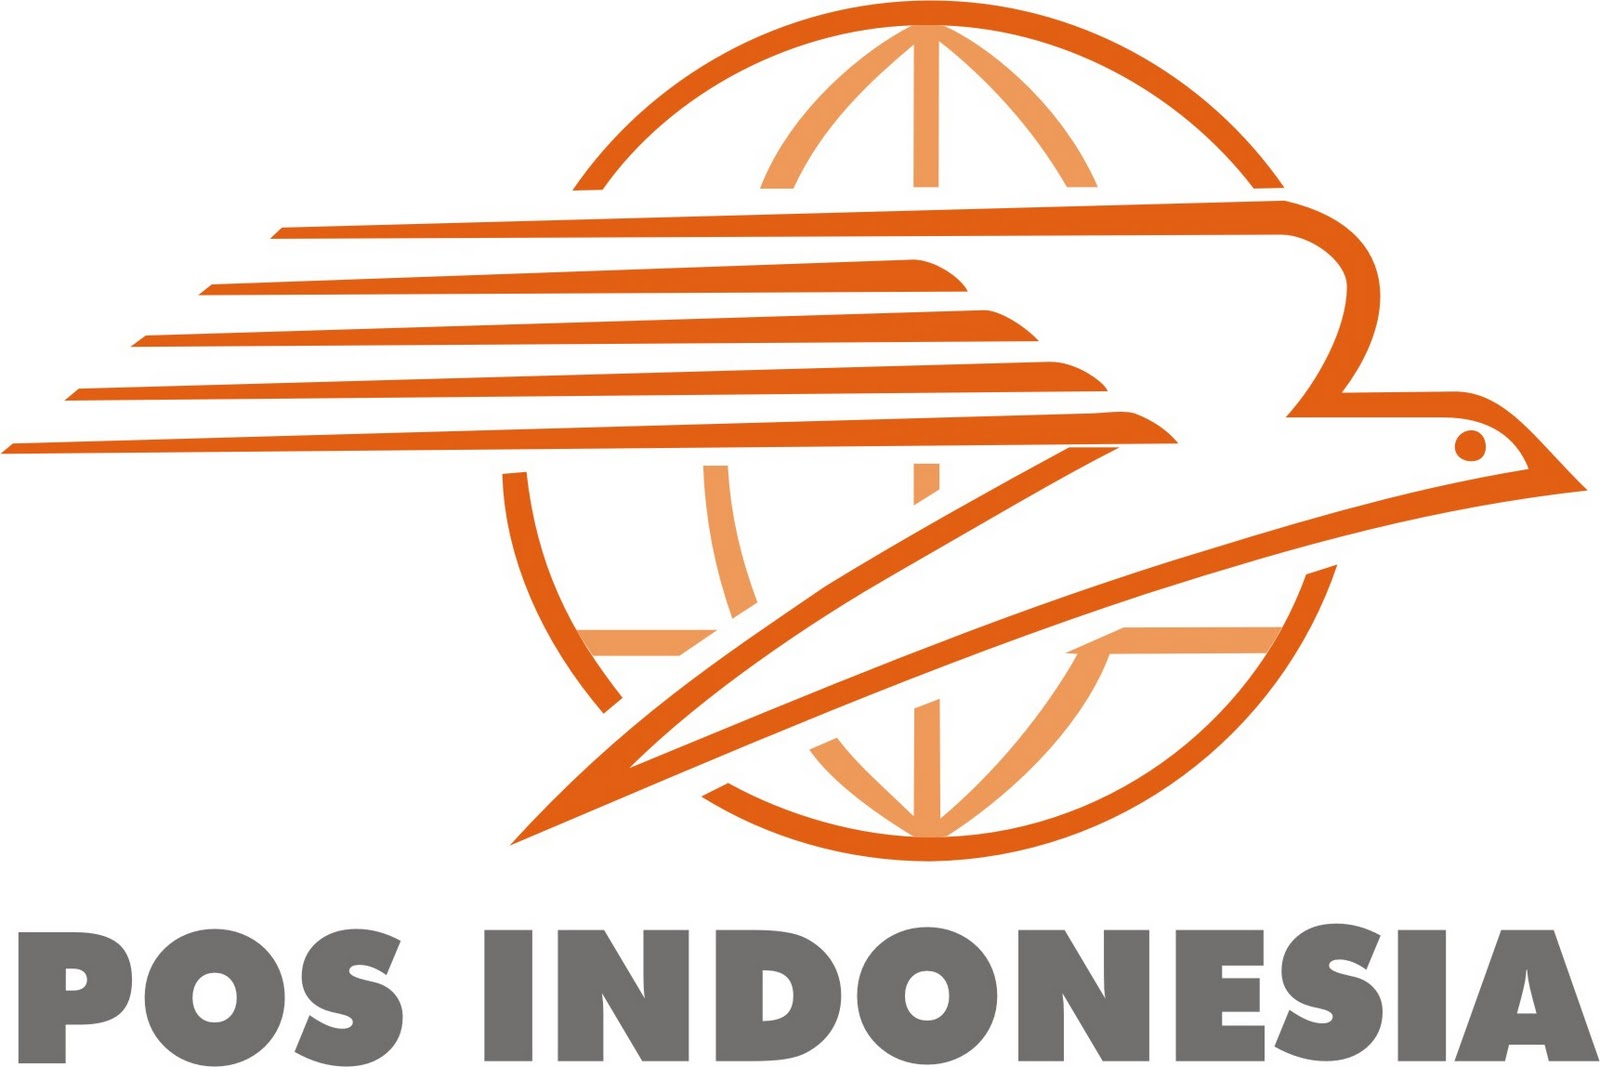 Logo Bank dan Pos Indonesia - Ardi La Madi's Blog